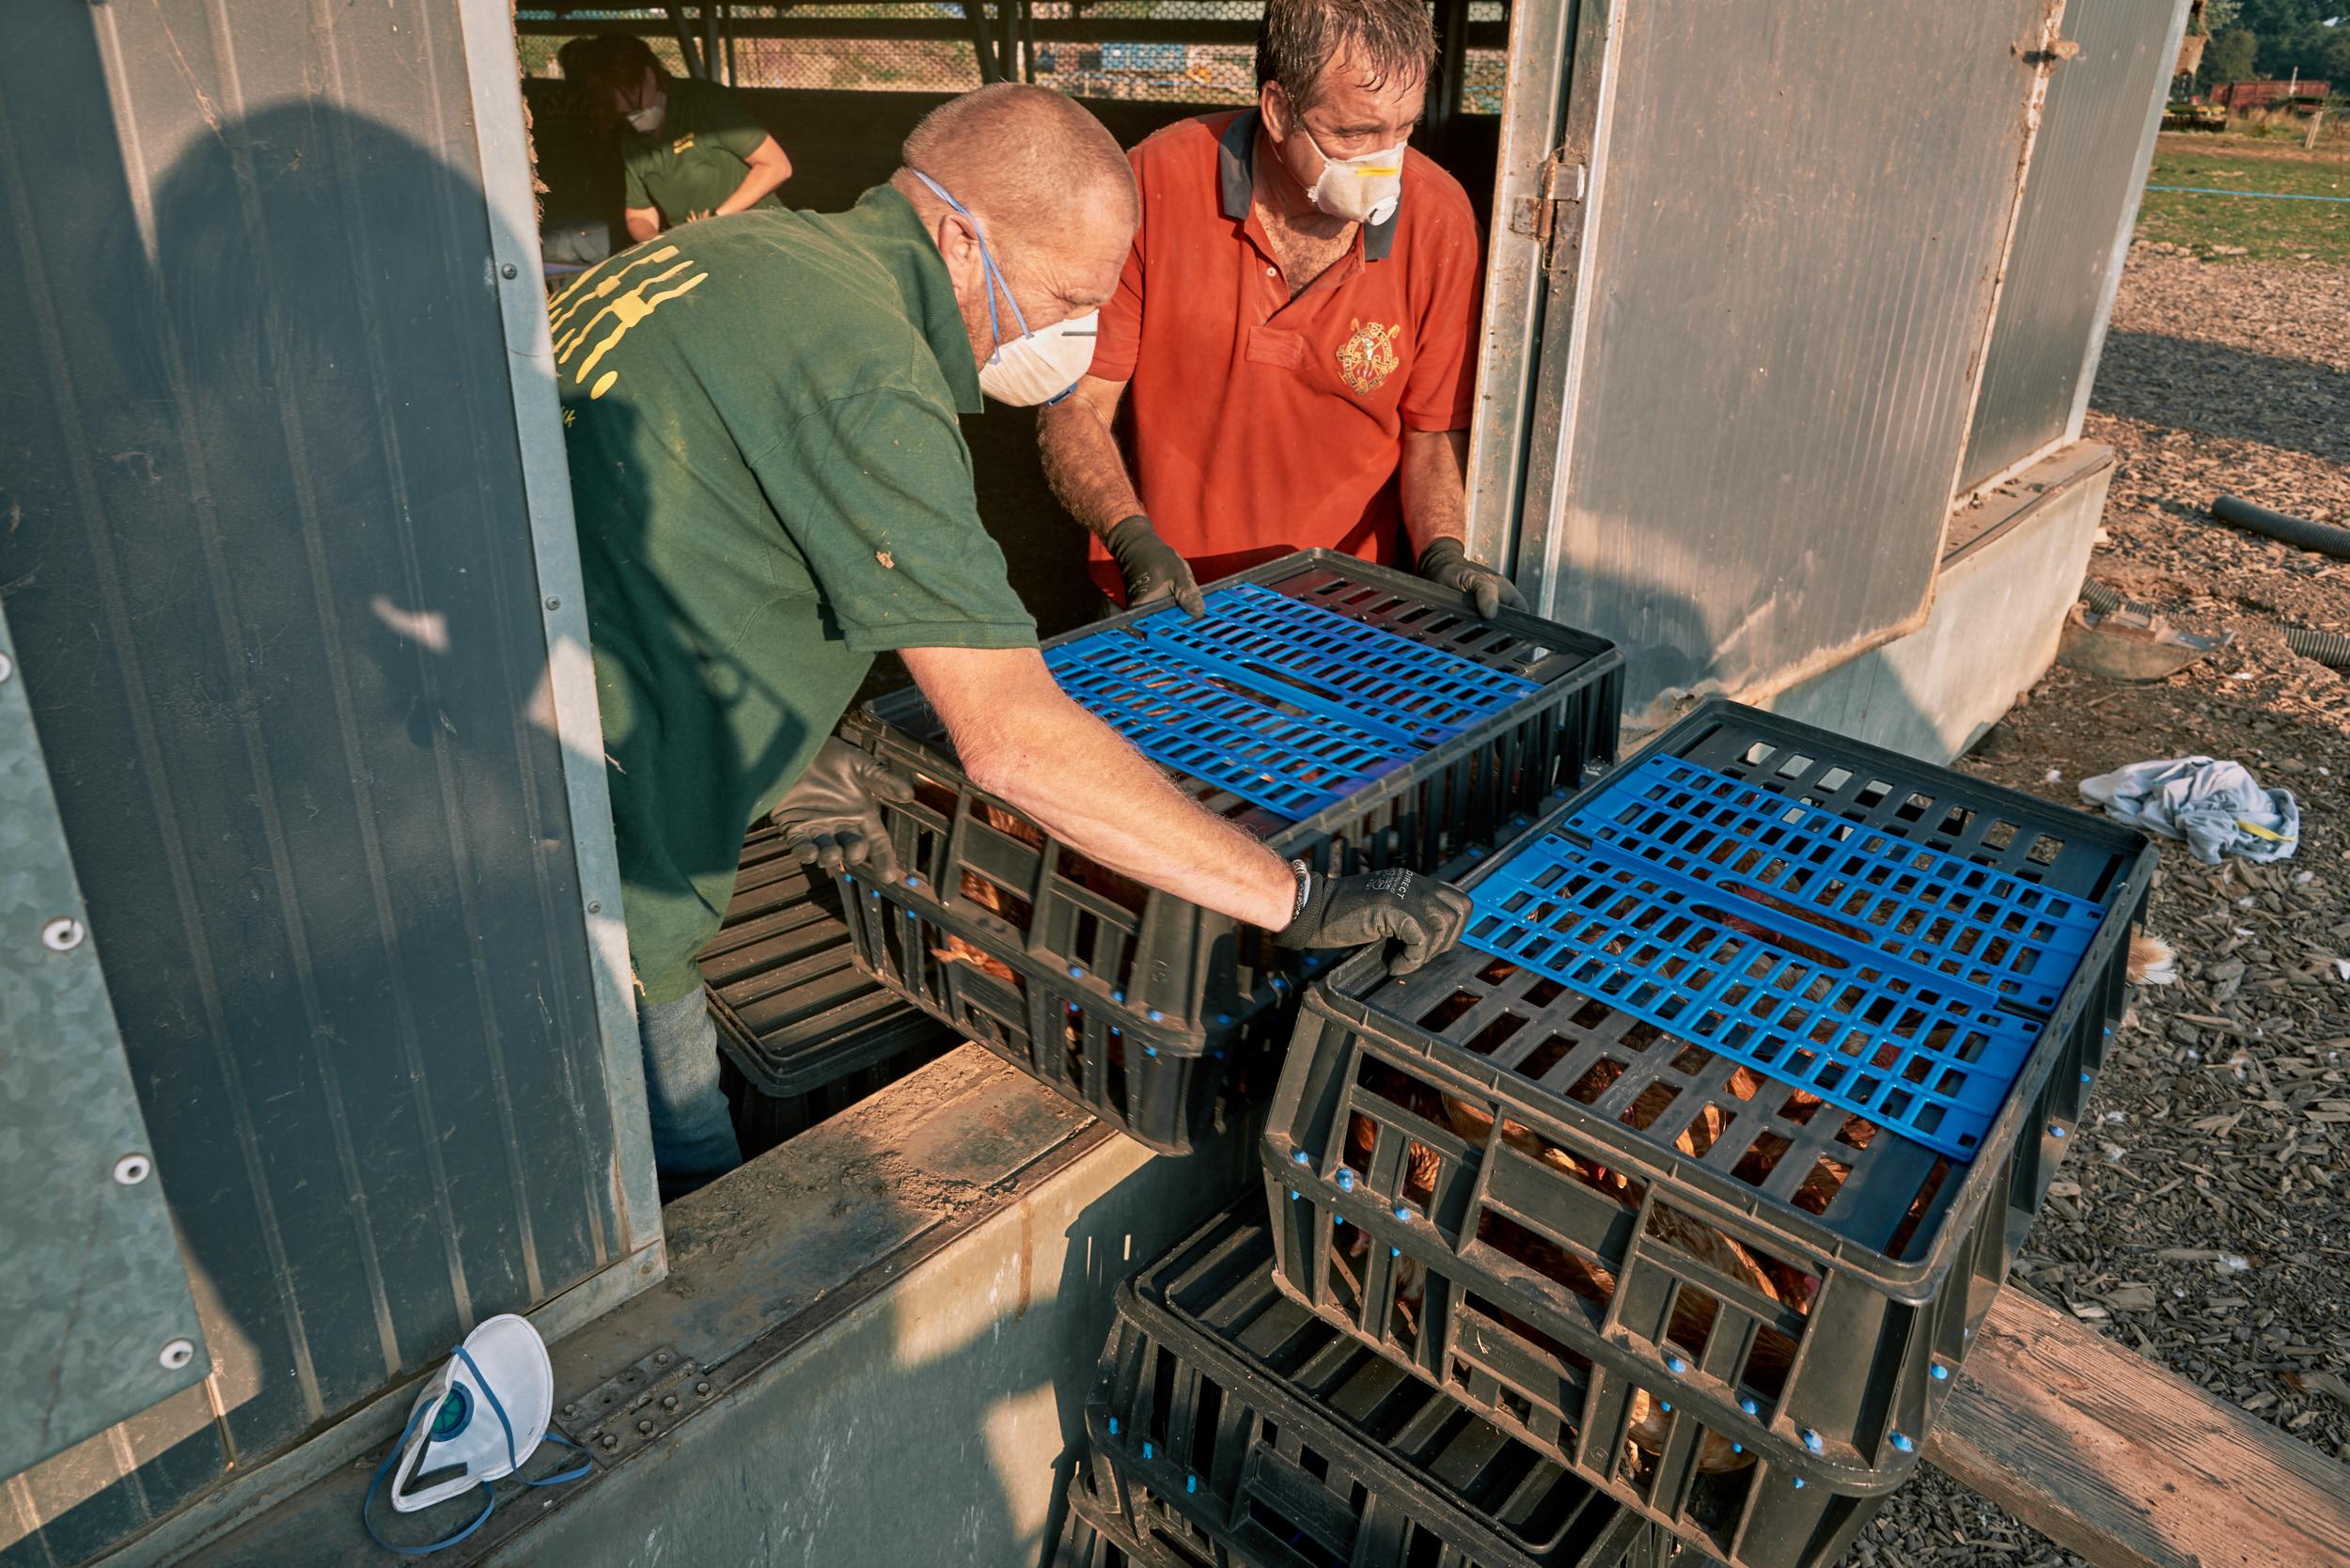 rookery-farm-organic-eggs-FSFH-rehoming24.jpg